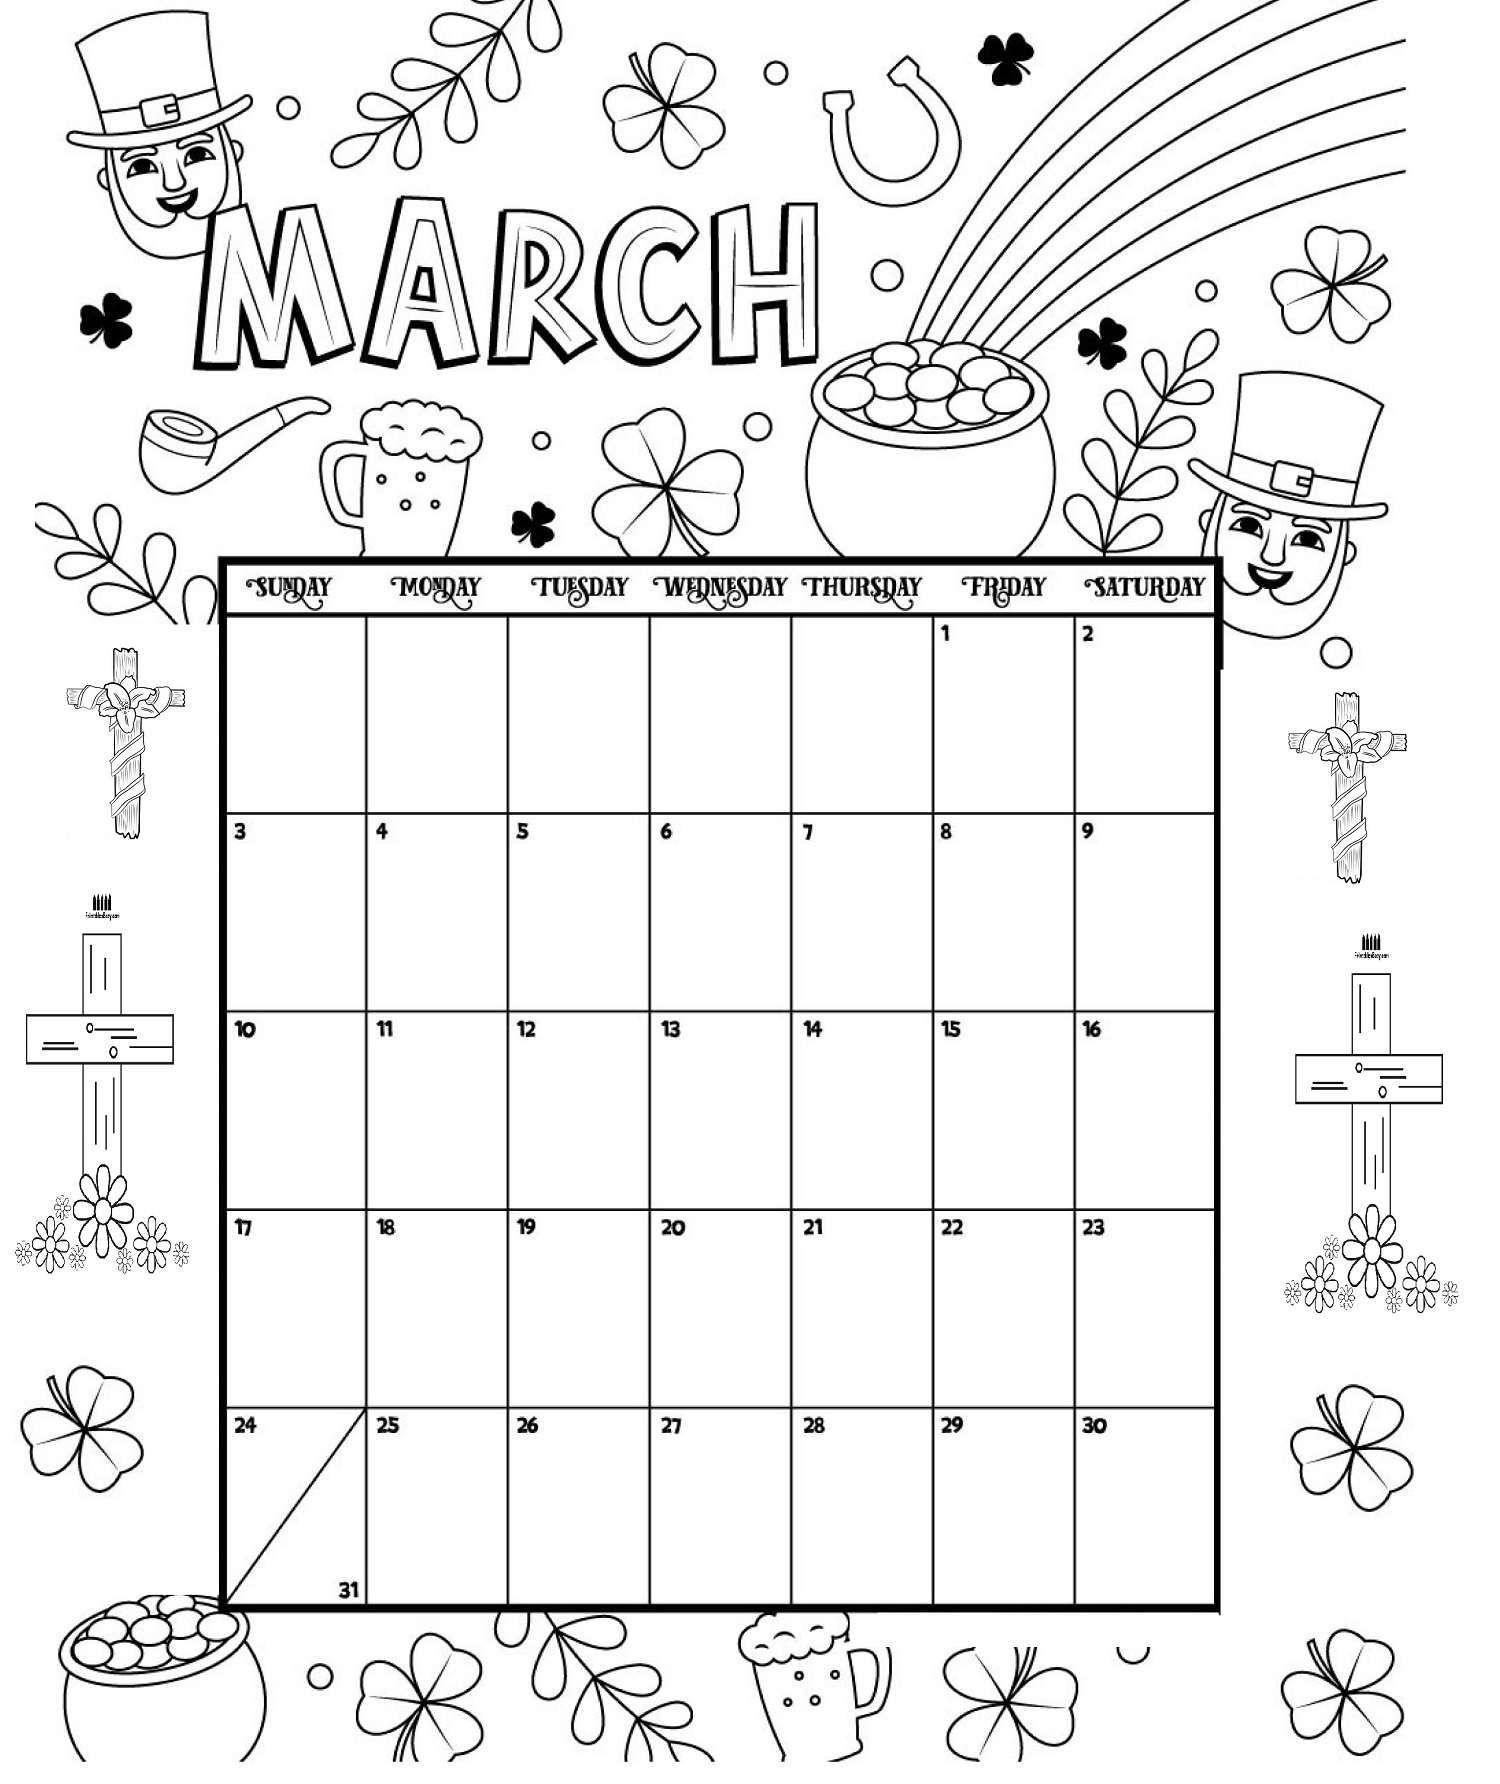 March Printable Coloring Calendar